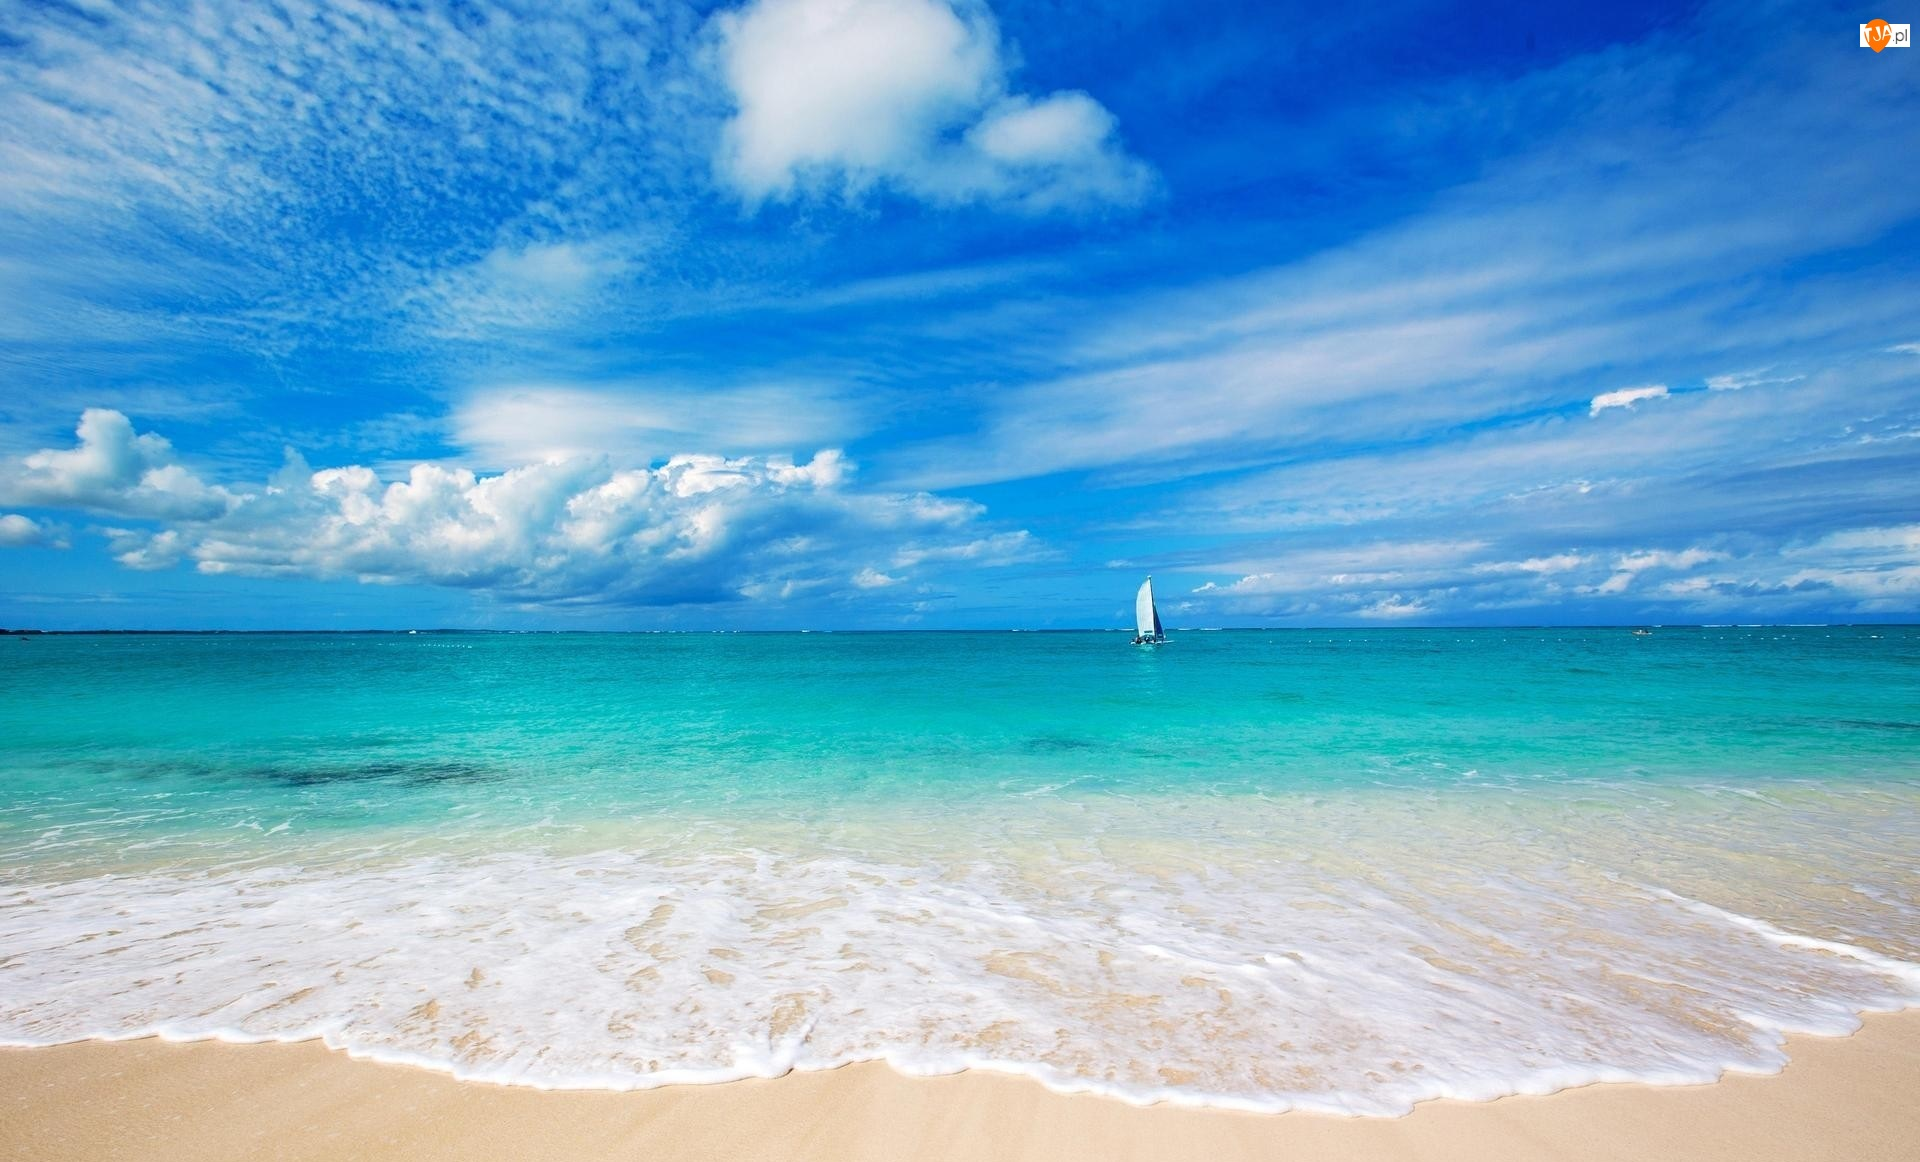 Plaża, Morze, Turks i Caicos, Bahamy, Żaglówka, Plaża Grace Bay Beach, Niebo